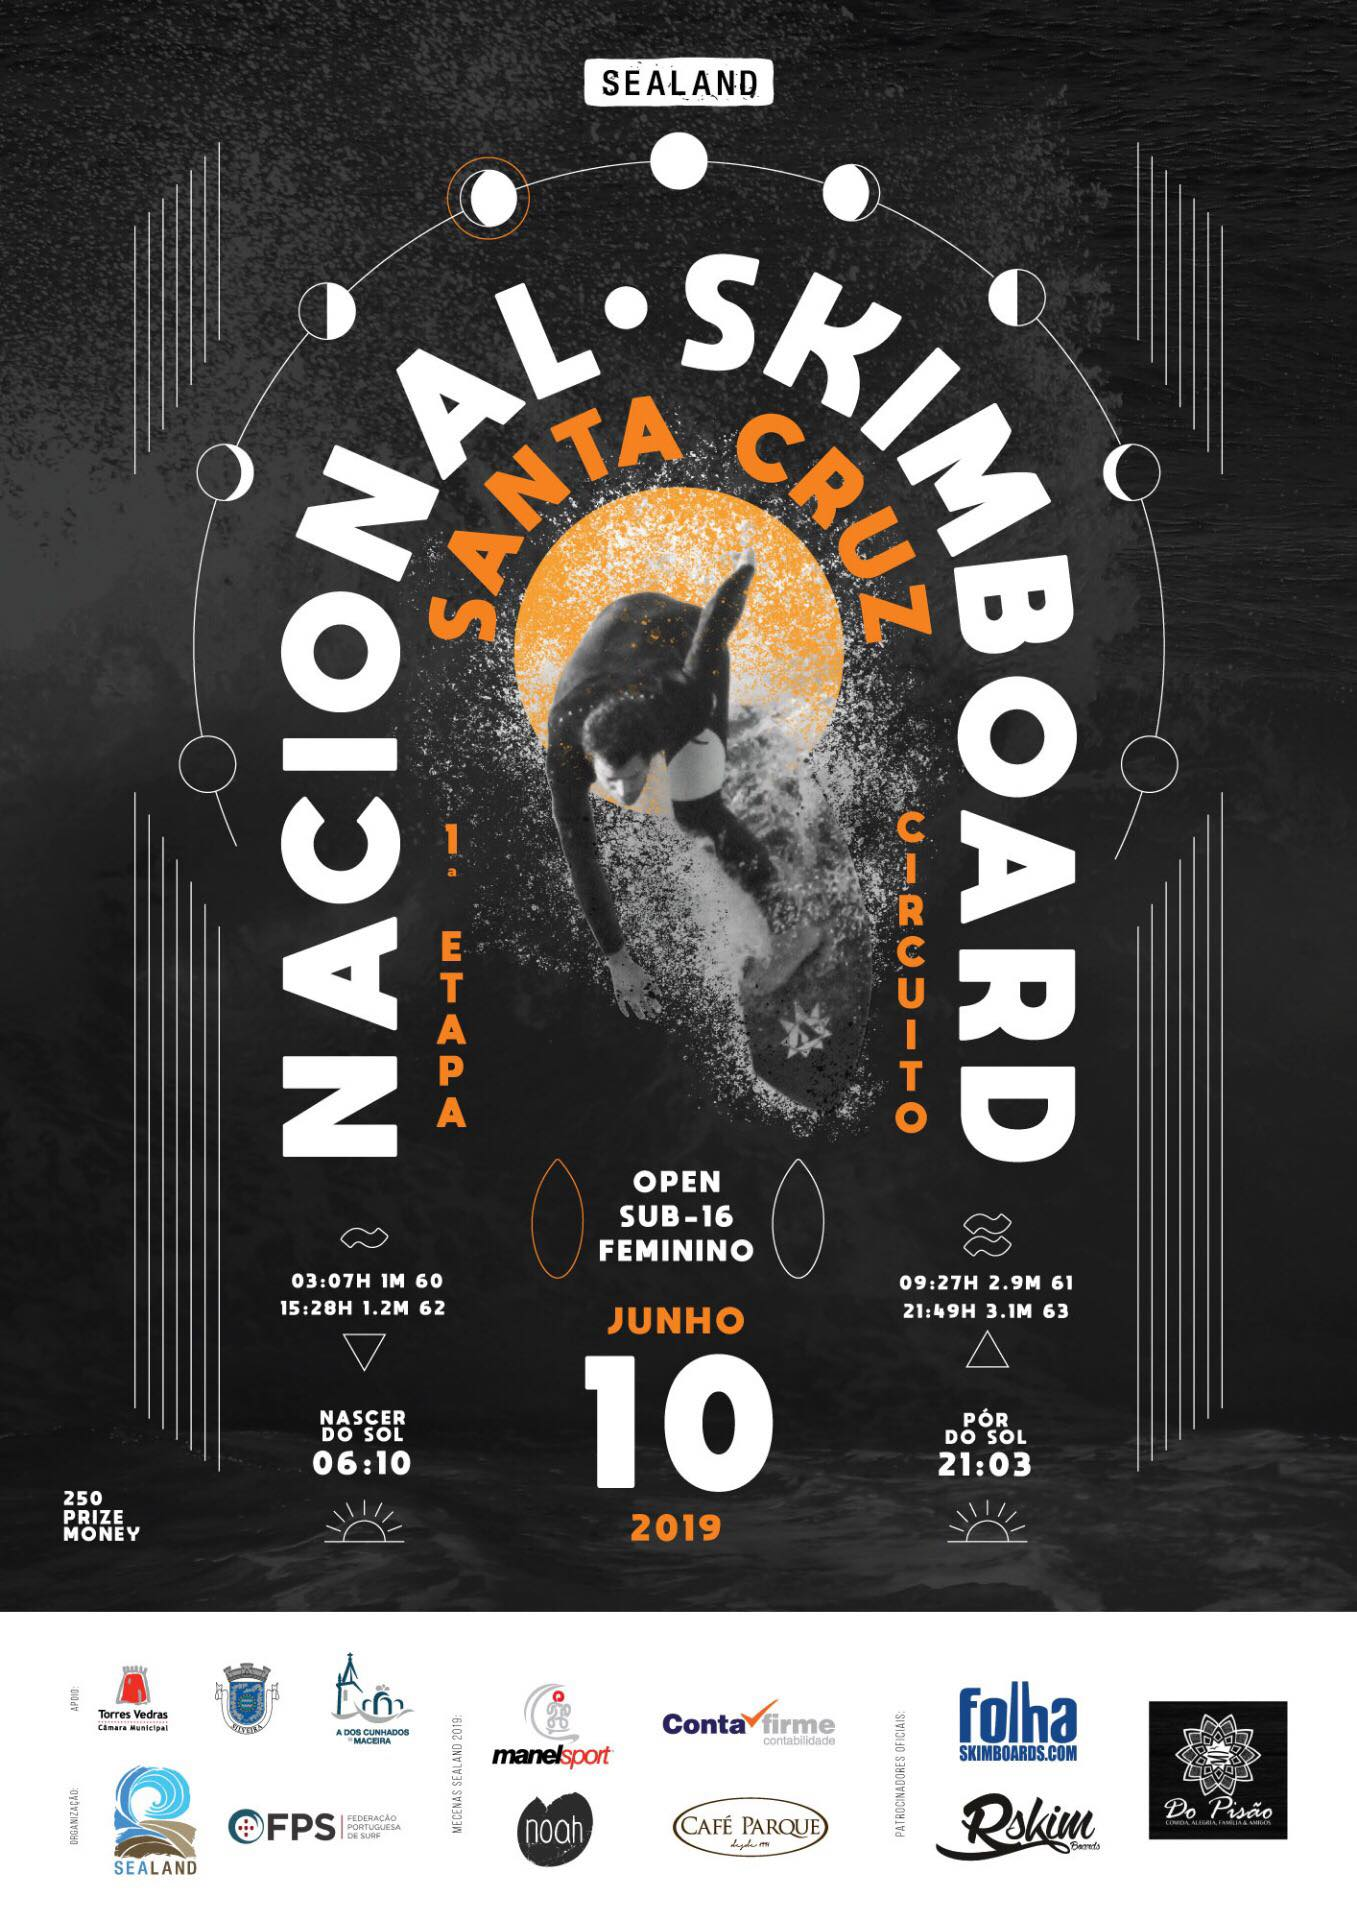 Nacional de Skimboard